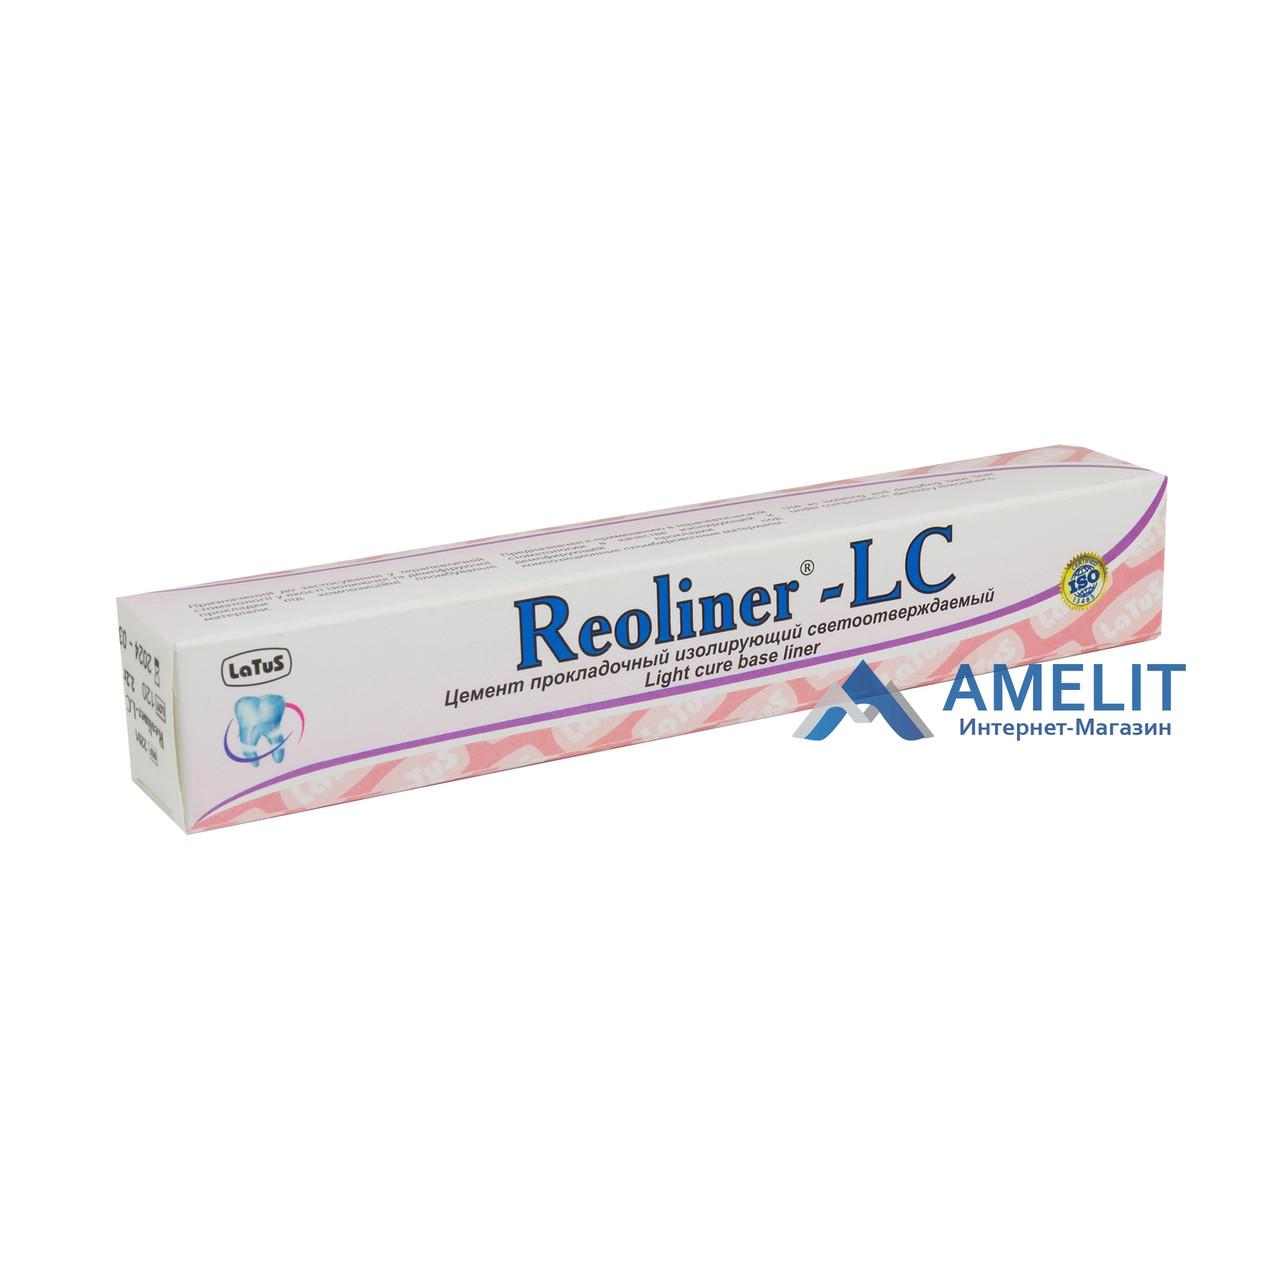 Реолайнер-ЛЦ (Reoliner-LC, Латус), шприц 2г